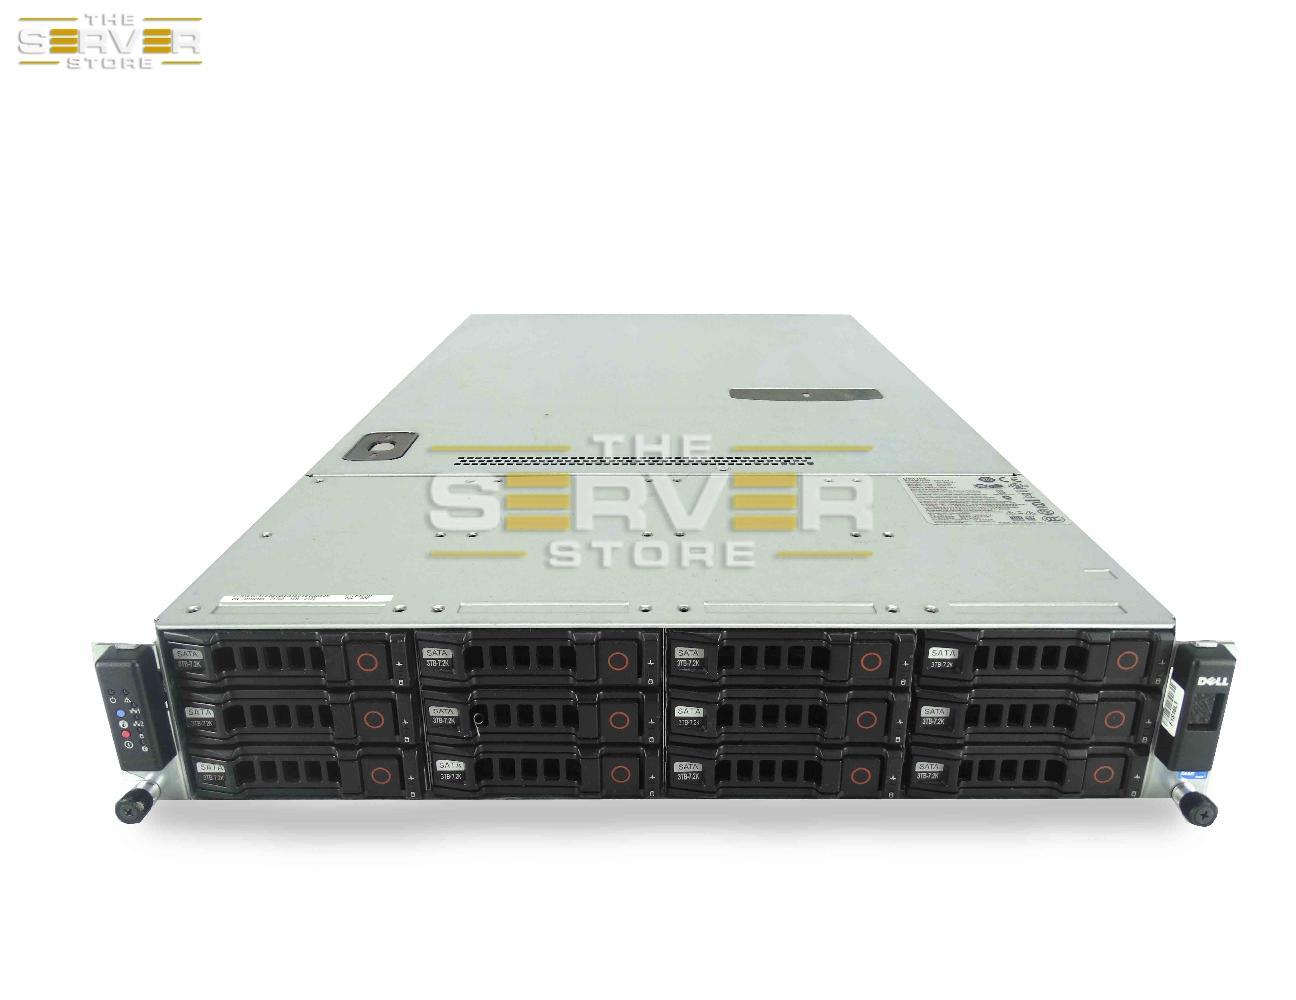 Dell PowerEdge C2100 12x 2U LFF Server